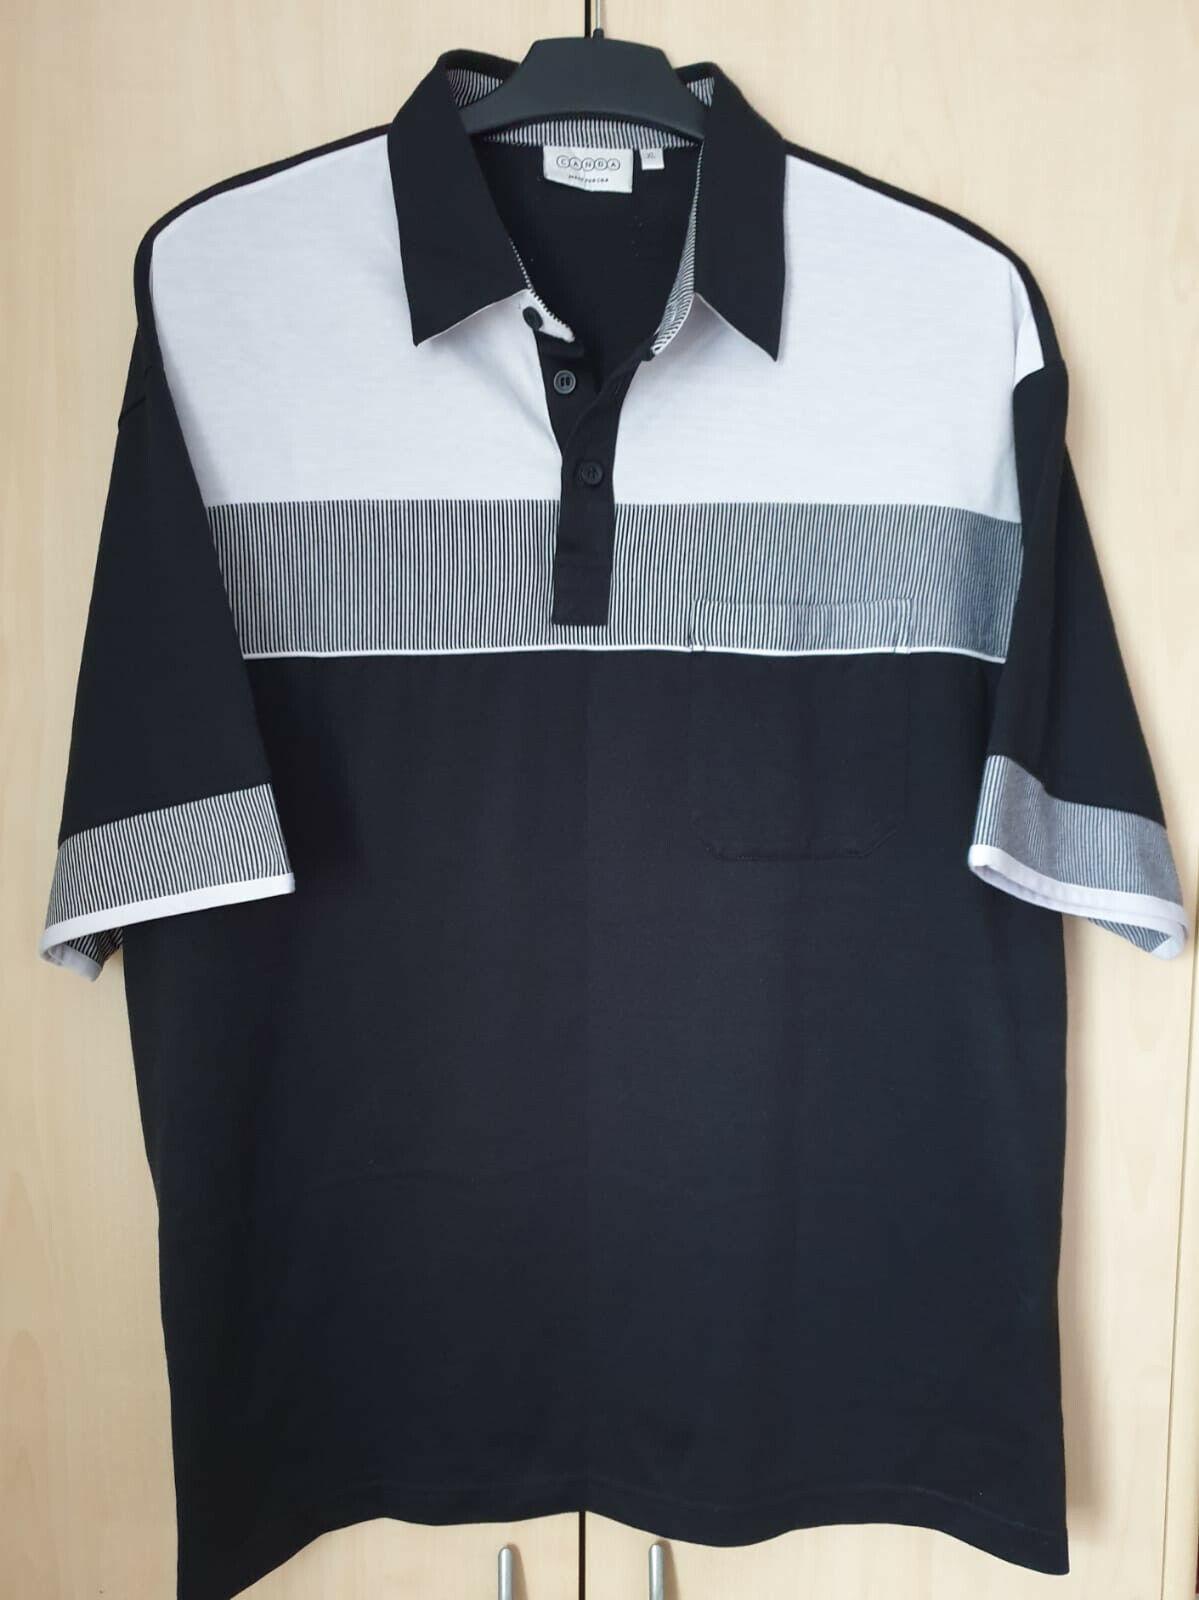 Herren T-Shirt, Gr. XL,Mehrfarbig, Kurzarm, mit Muster